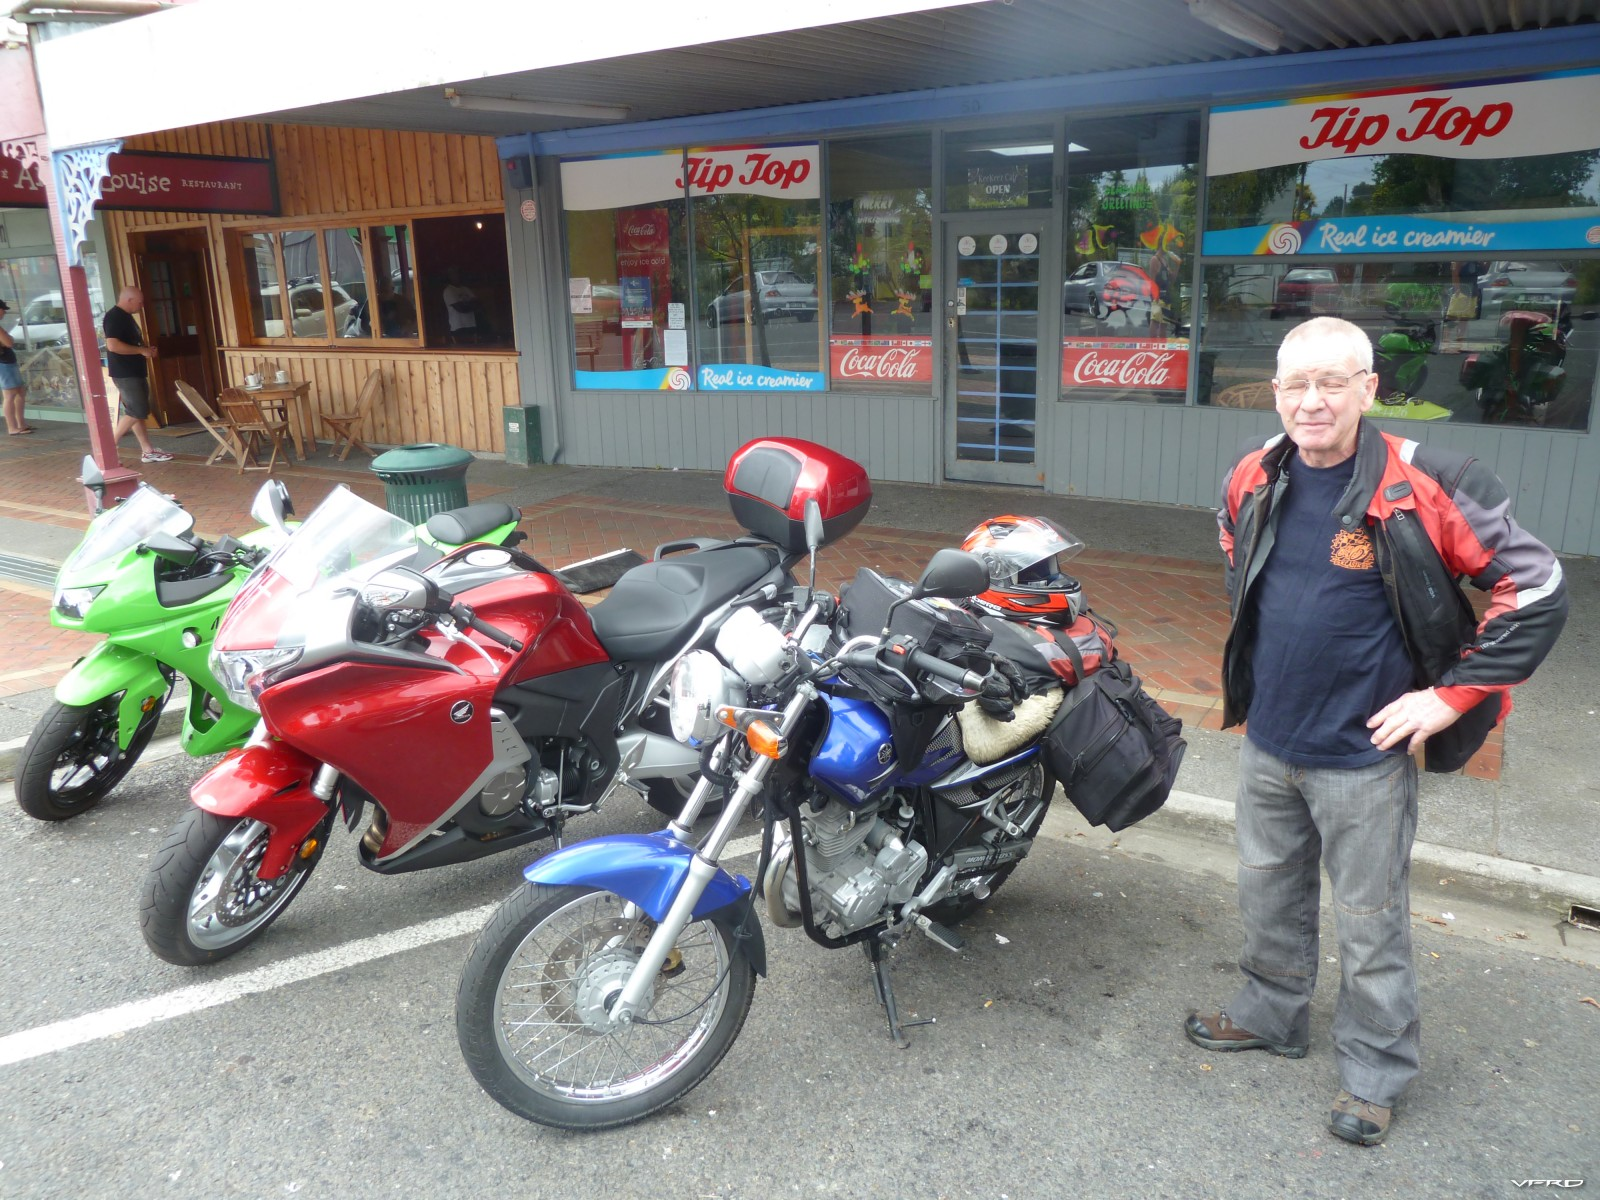 Old timer touring on 225cc Yamaha